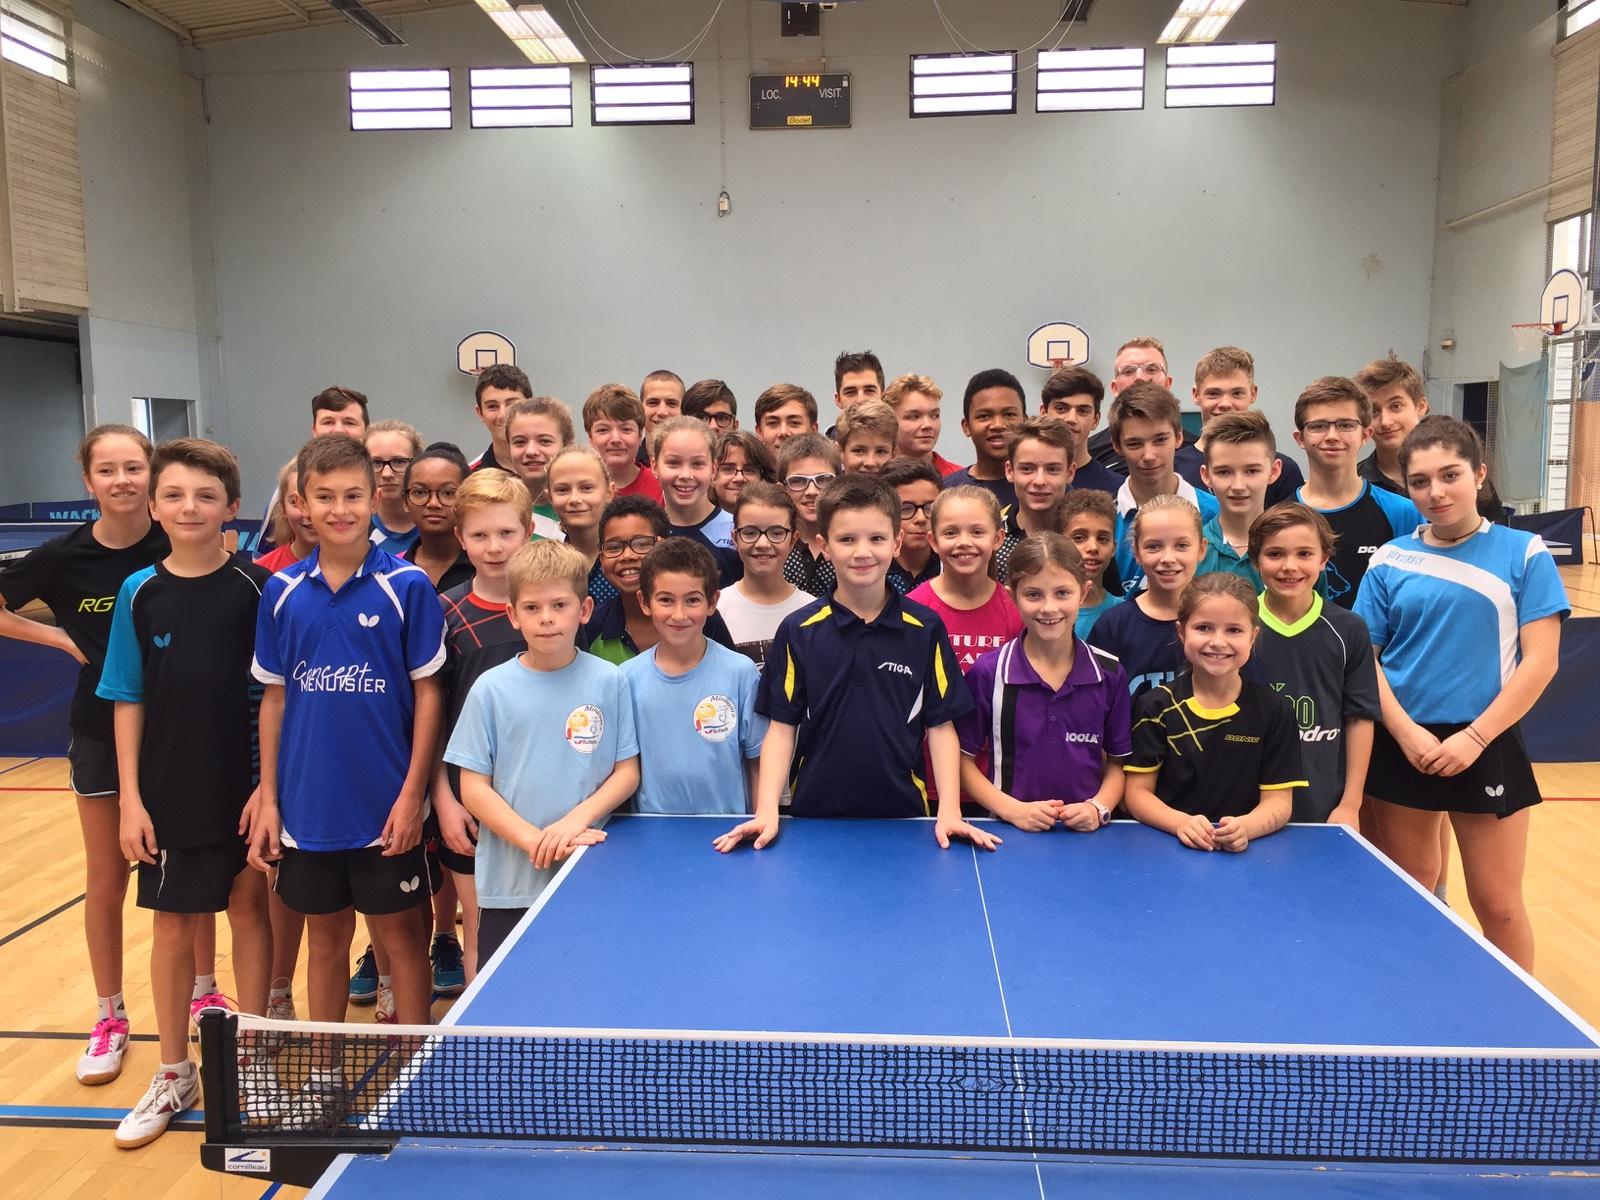 Ligue de normandie de tennis de table accueil - Ligue haute normandie tennis de table ...